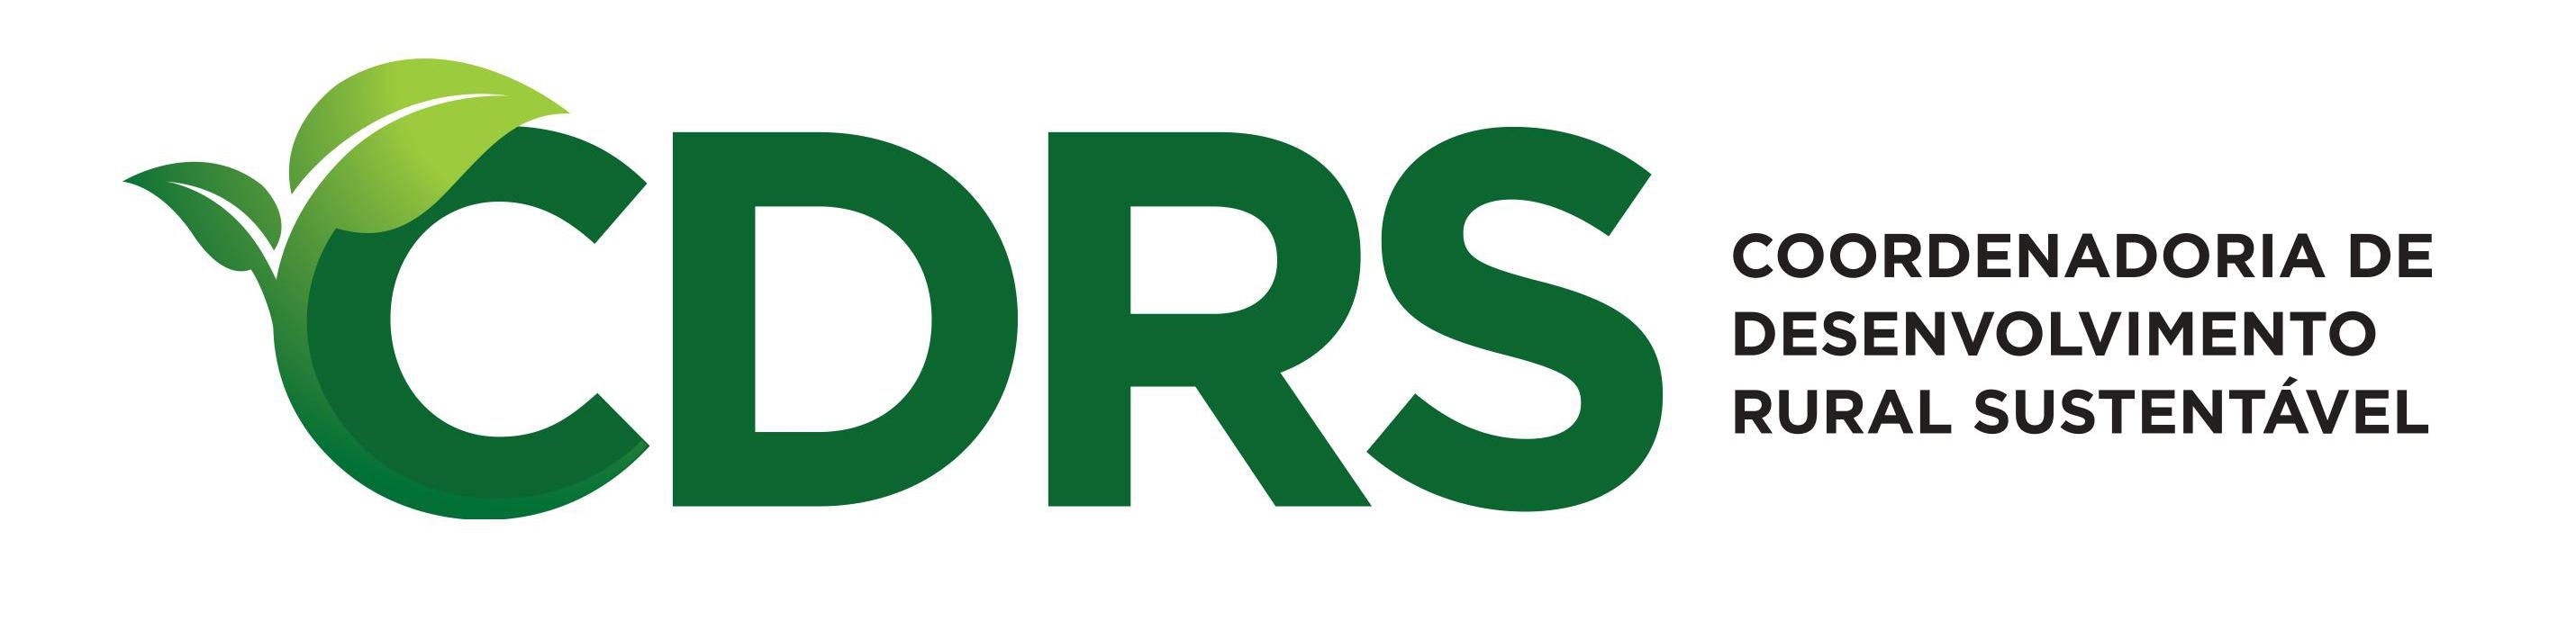 13379-logo-cdrs